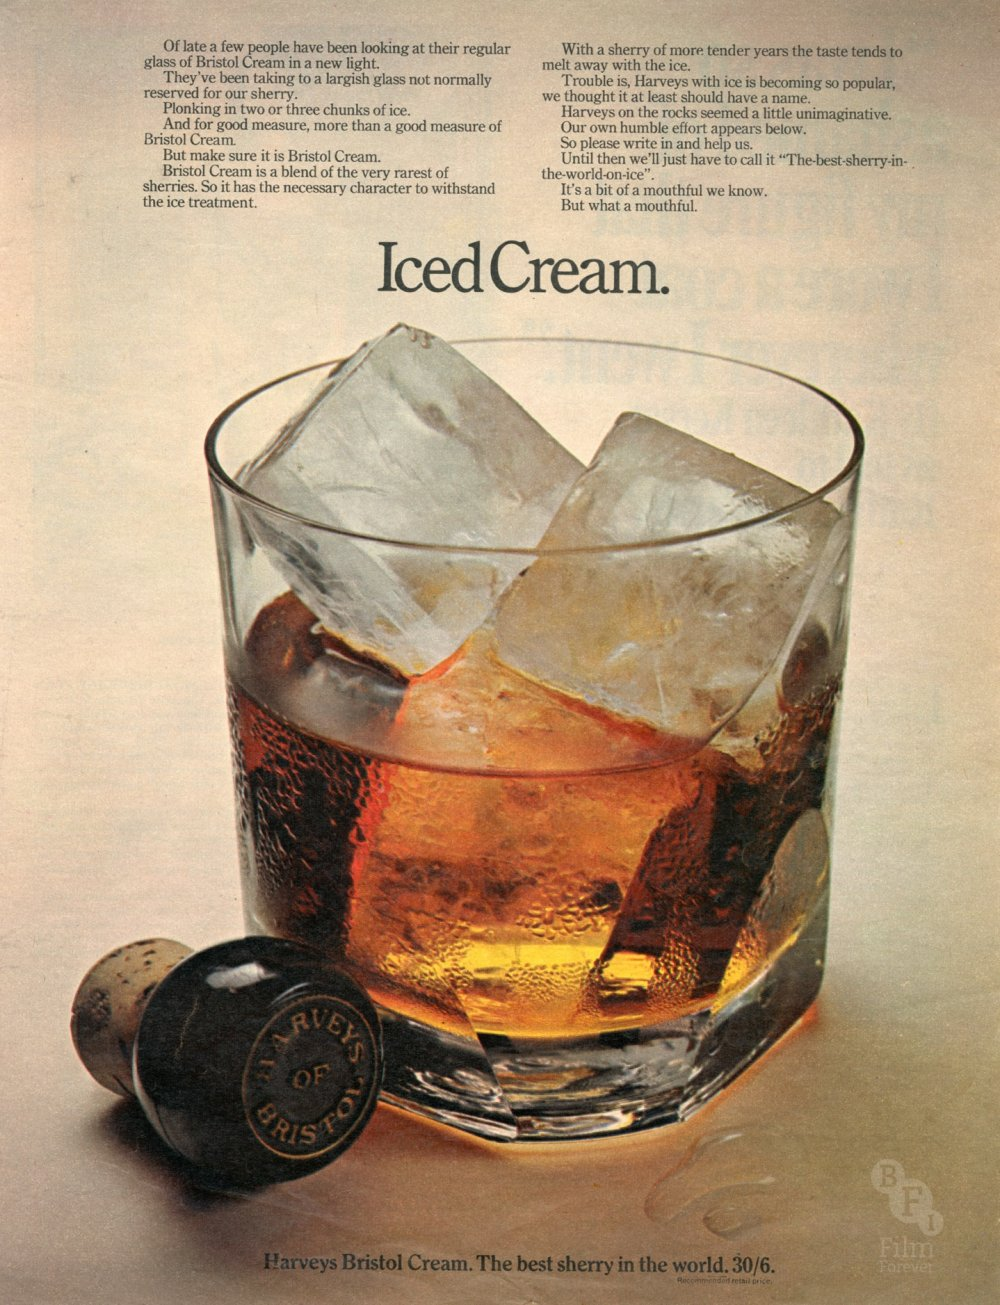 Iced Cream